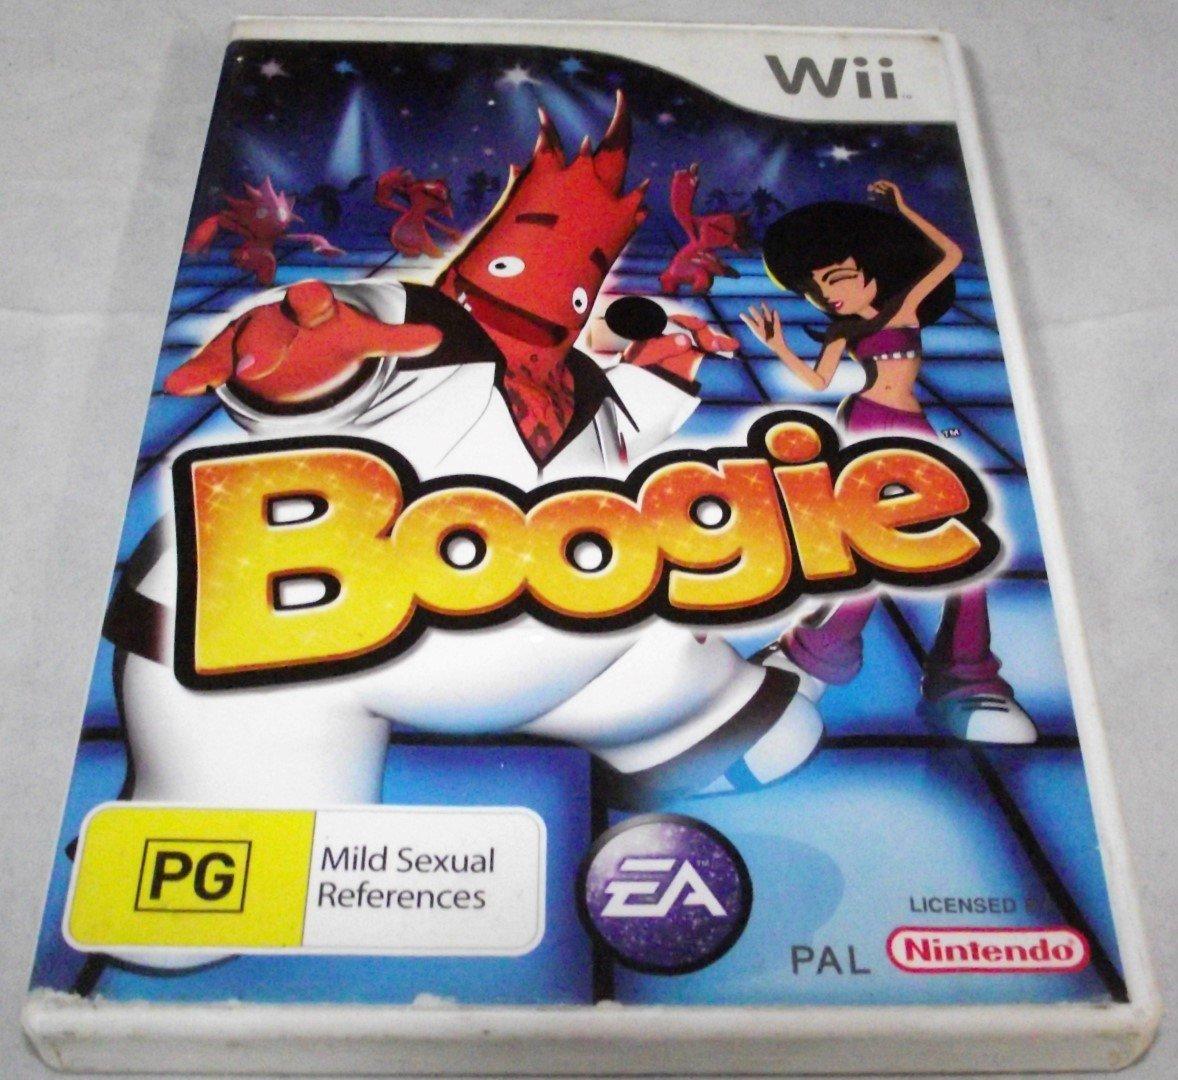 Boogie Nintendo Wii Pal Complete Wii U Compatible Ebay